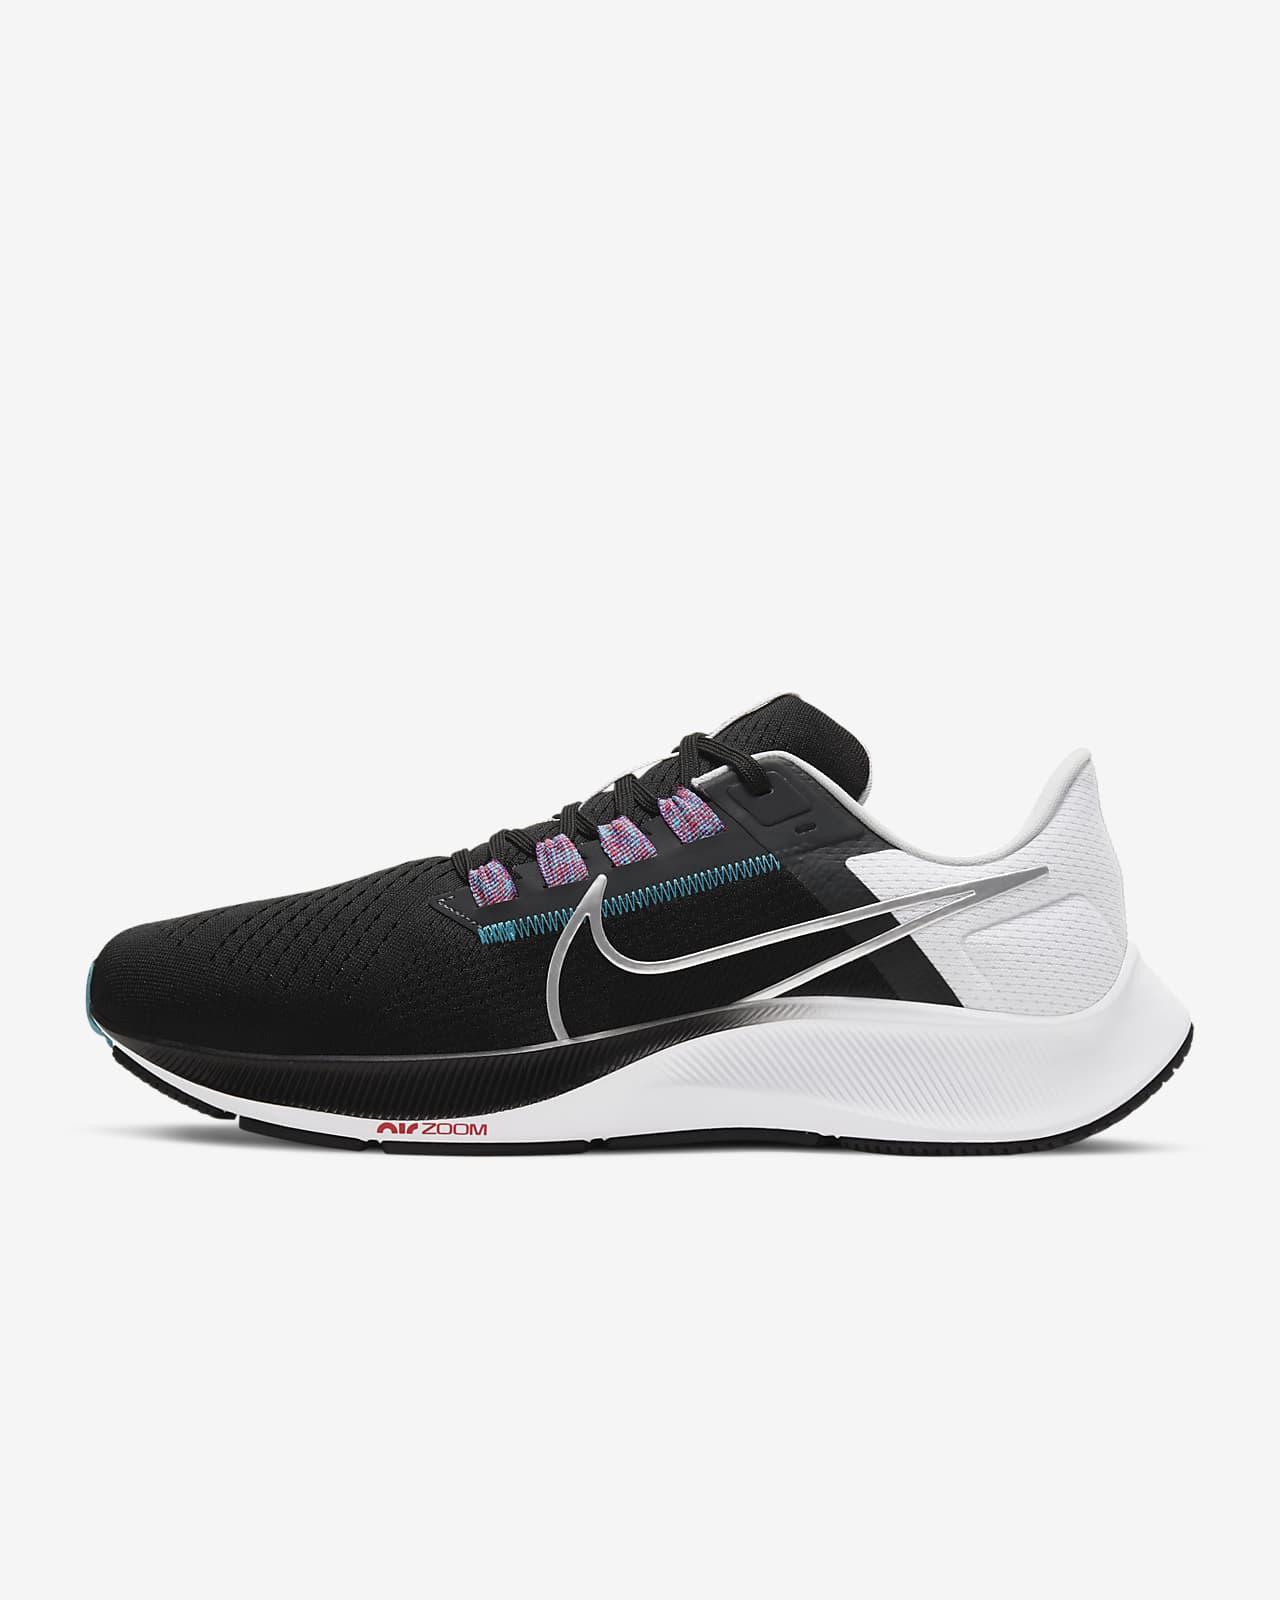 Chaussures de running Nike Air Zoom Pegasus 38 pour Homme